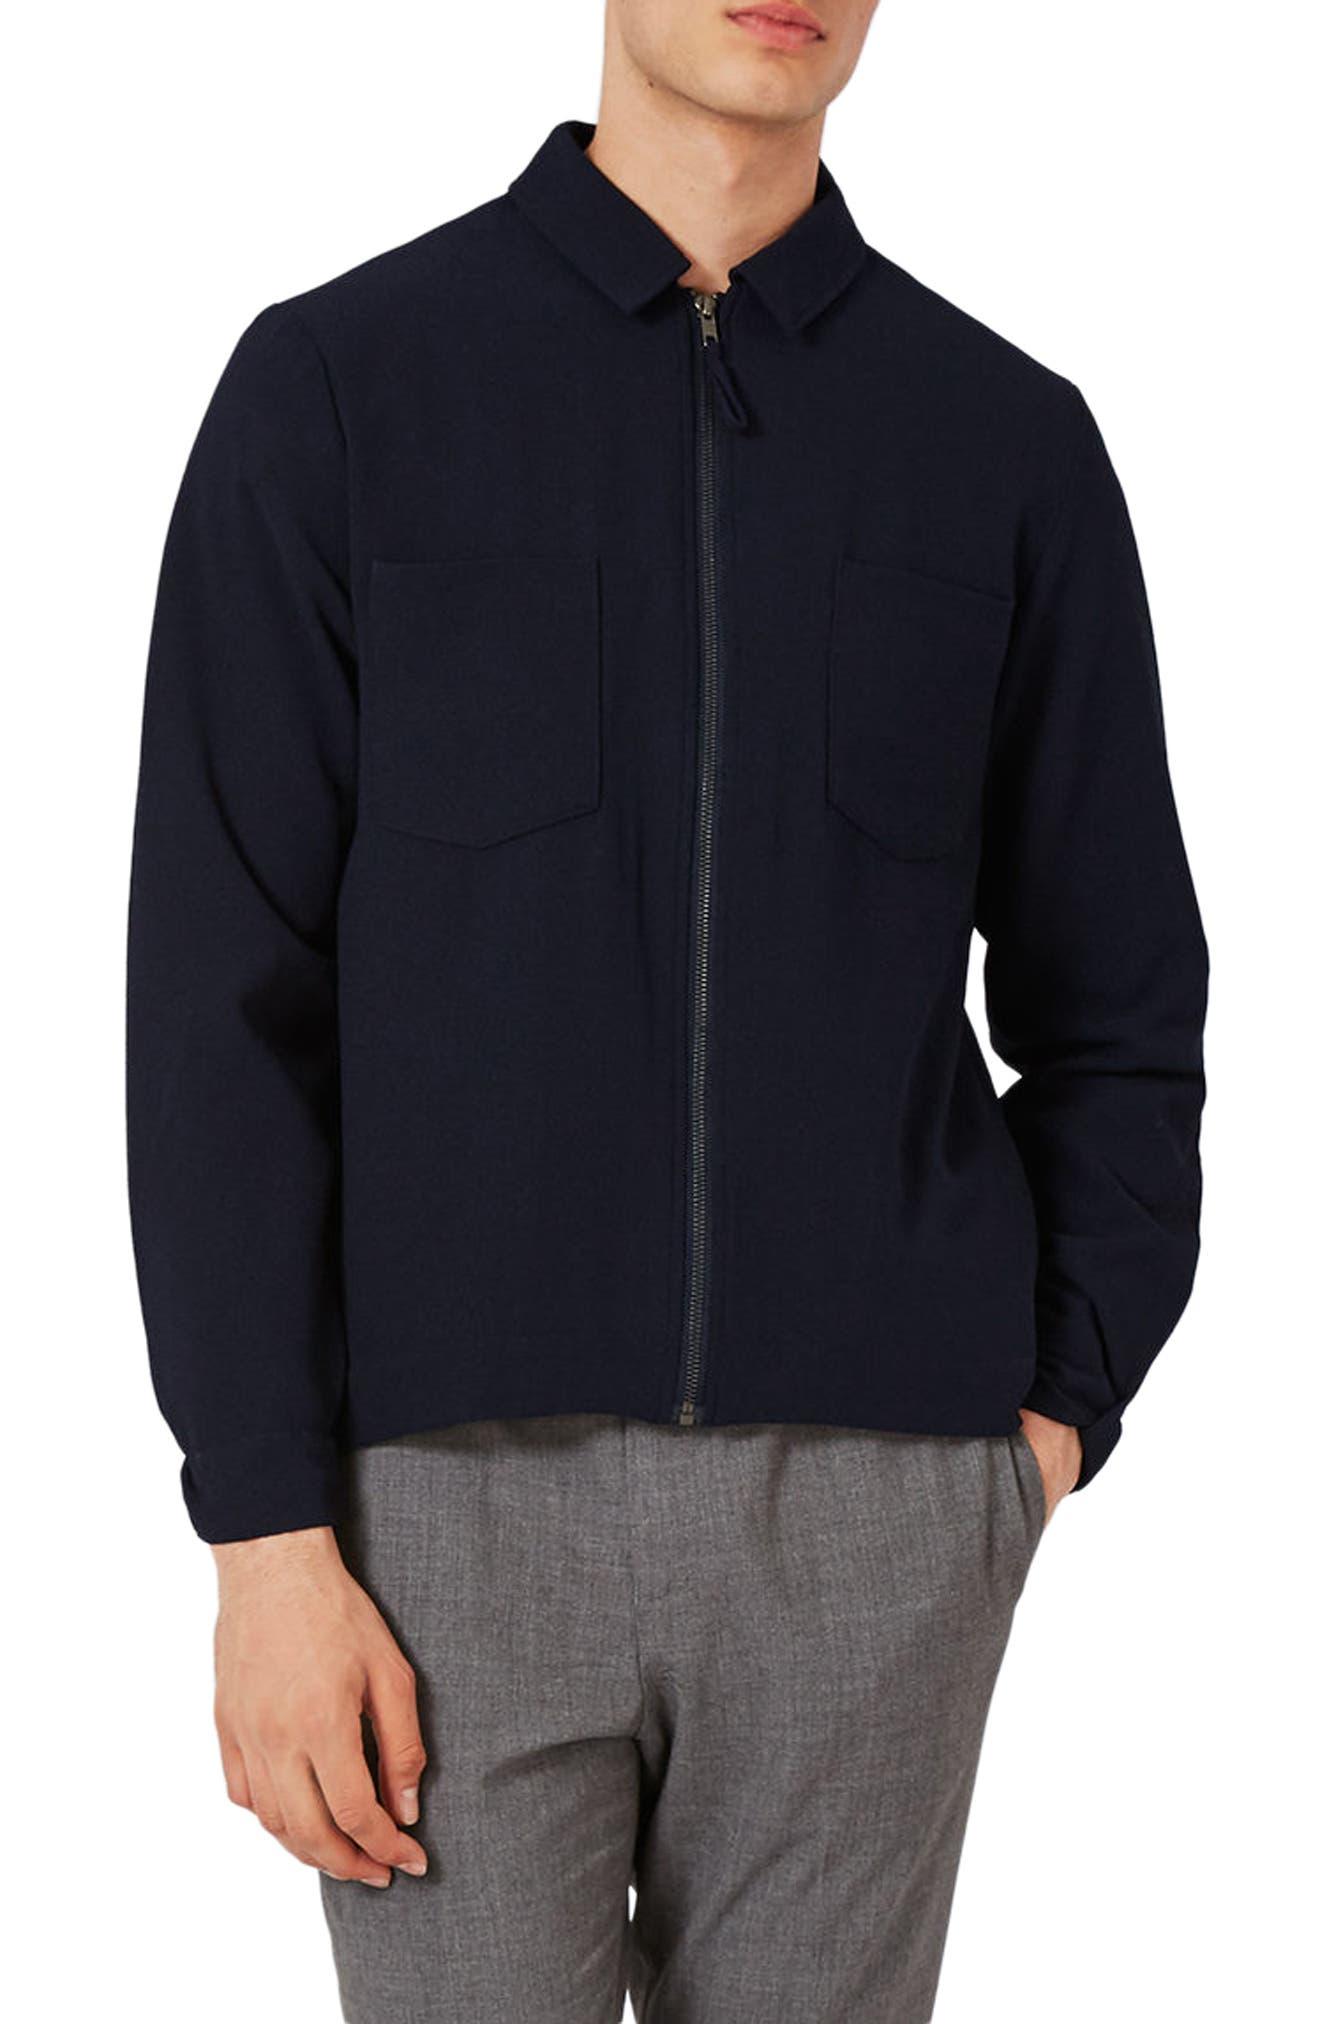 Topman Lightweight Smart Jacket